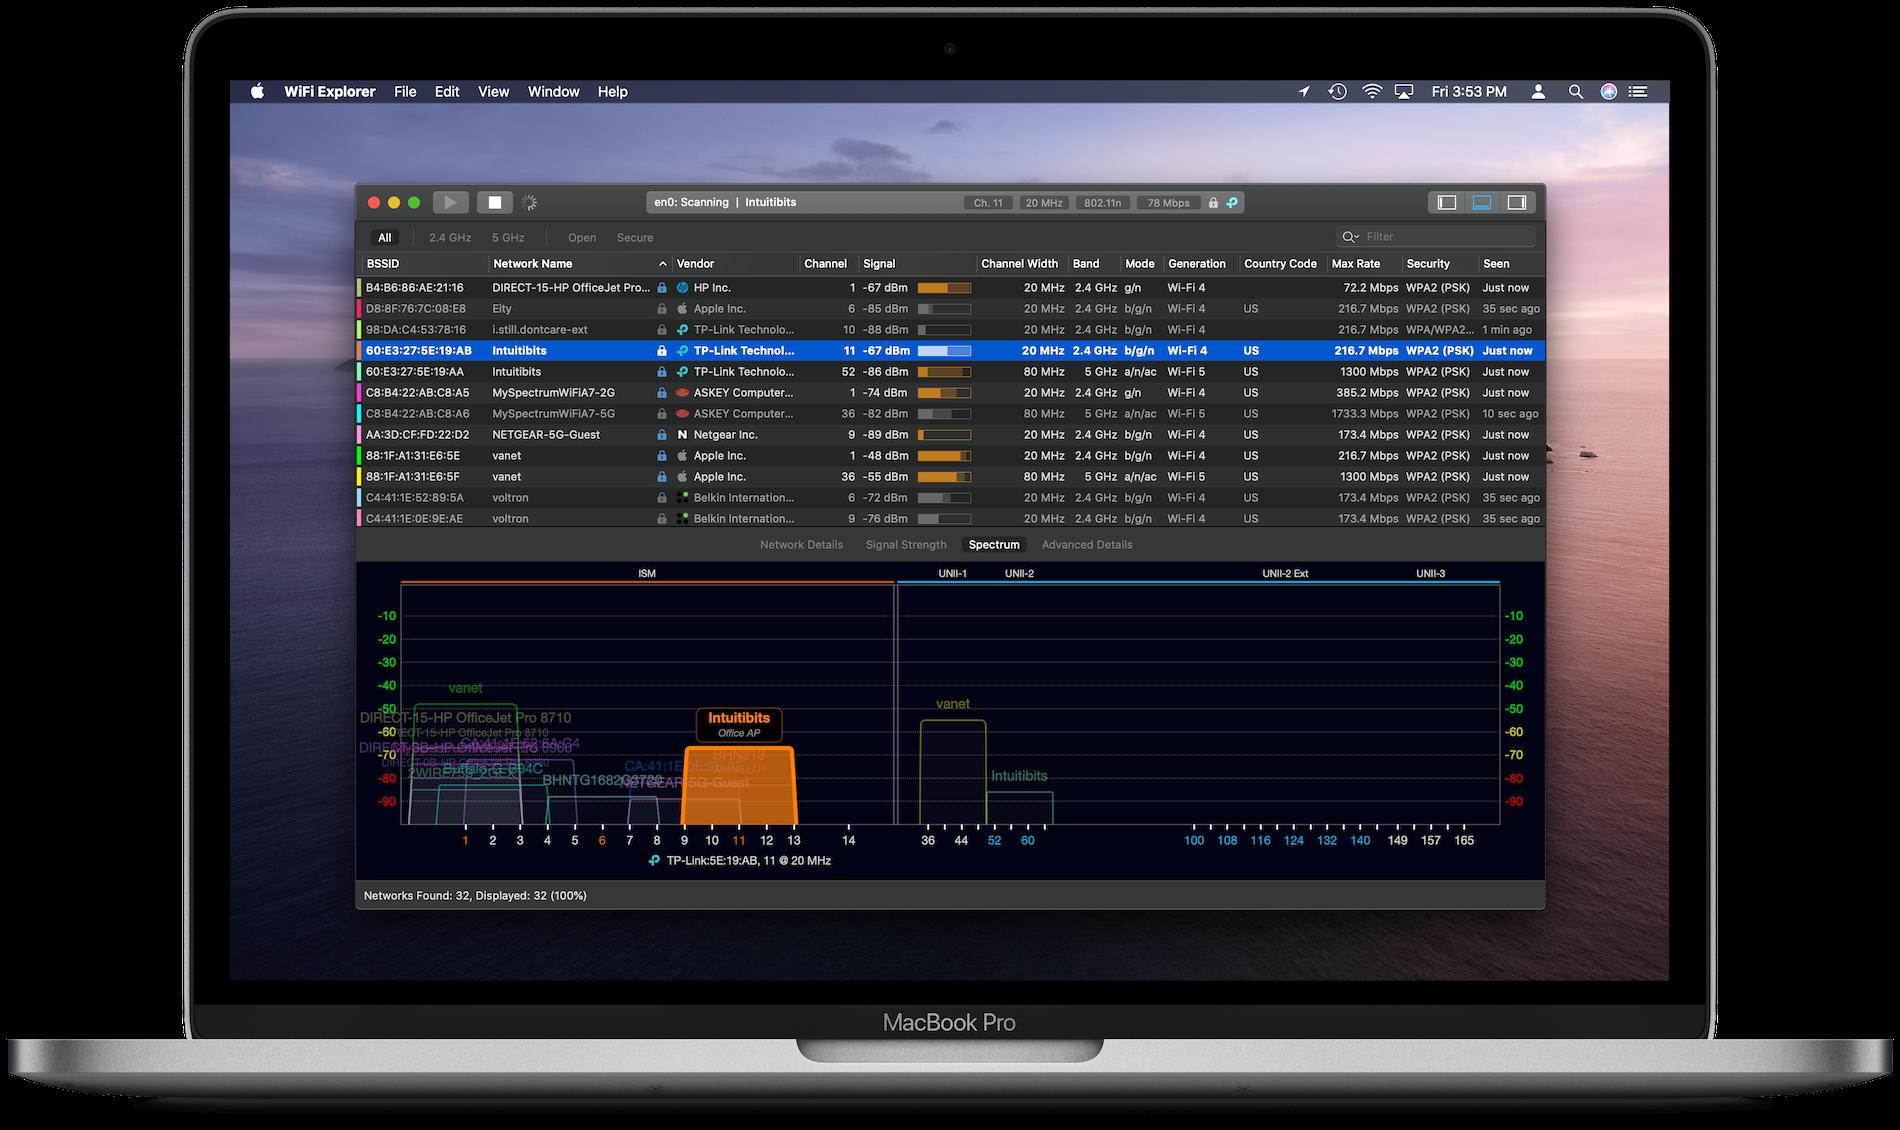 WiFi Explorer running on a MacBook Pro in dark mode